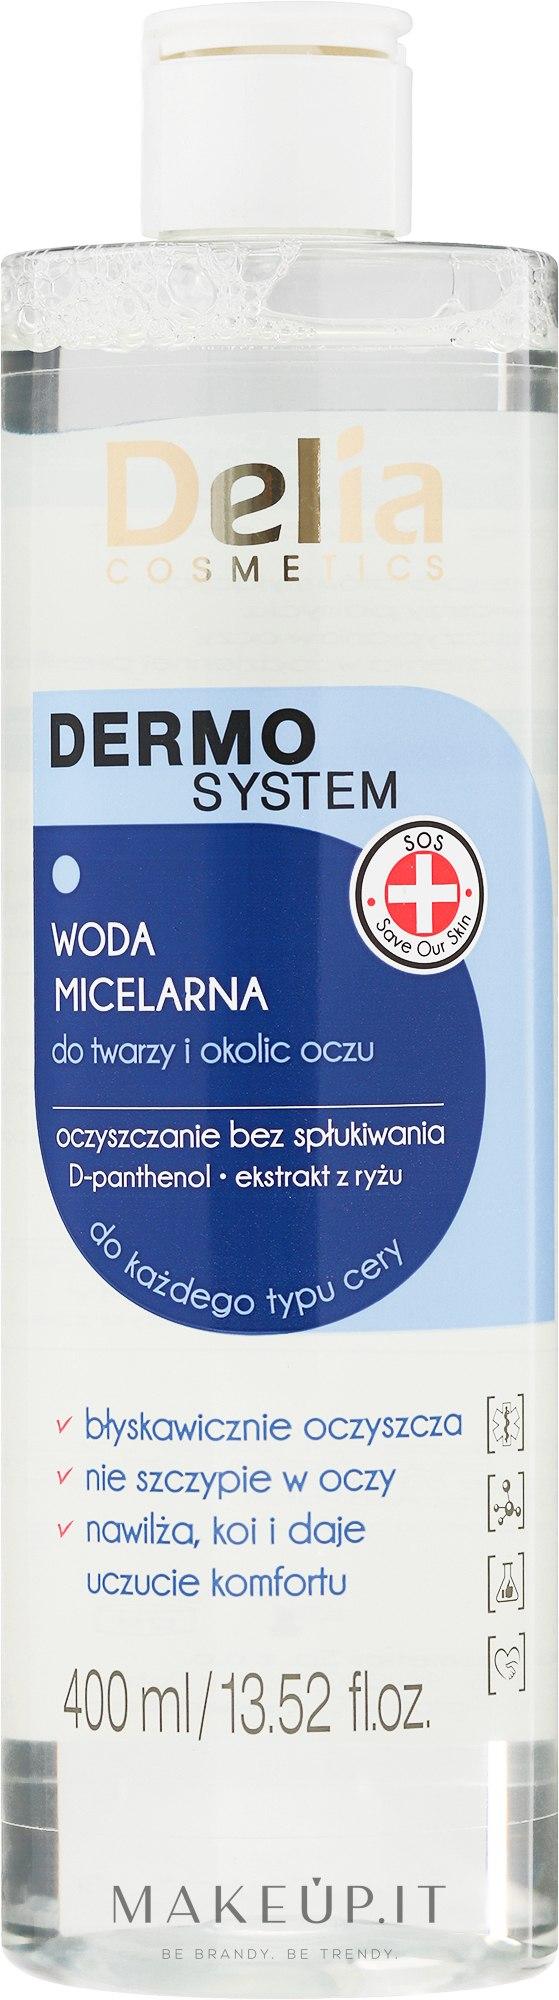 Struccante micellare - Delia Dermo System Micellar Makeup Remover — foto 200 ml